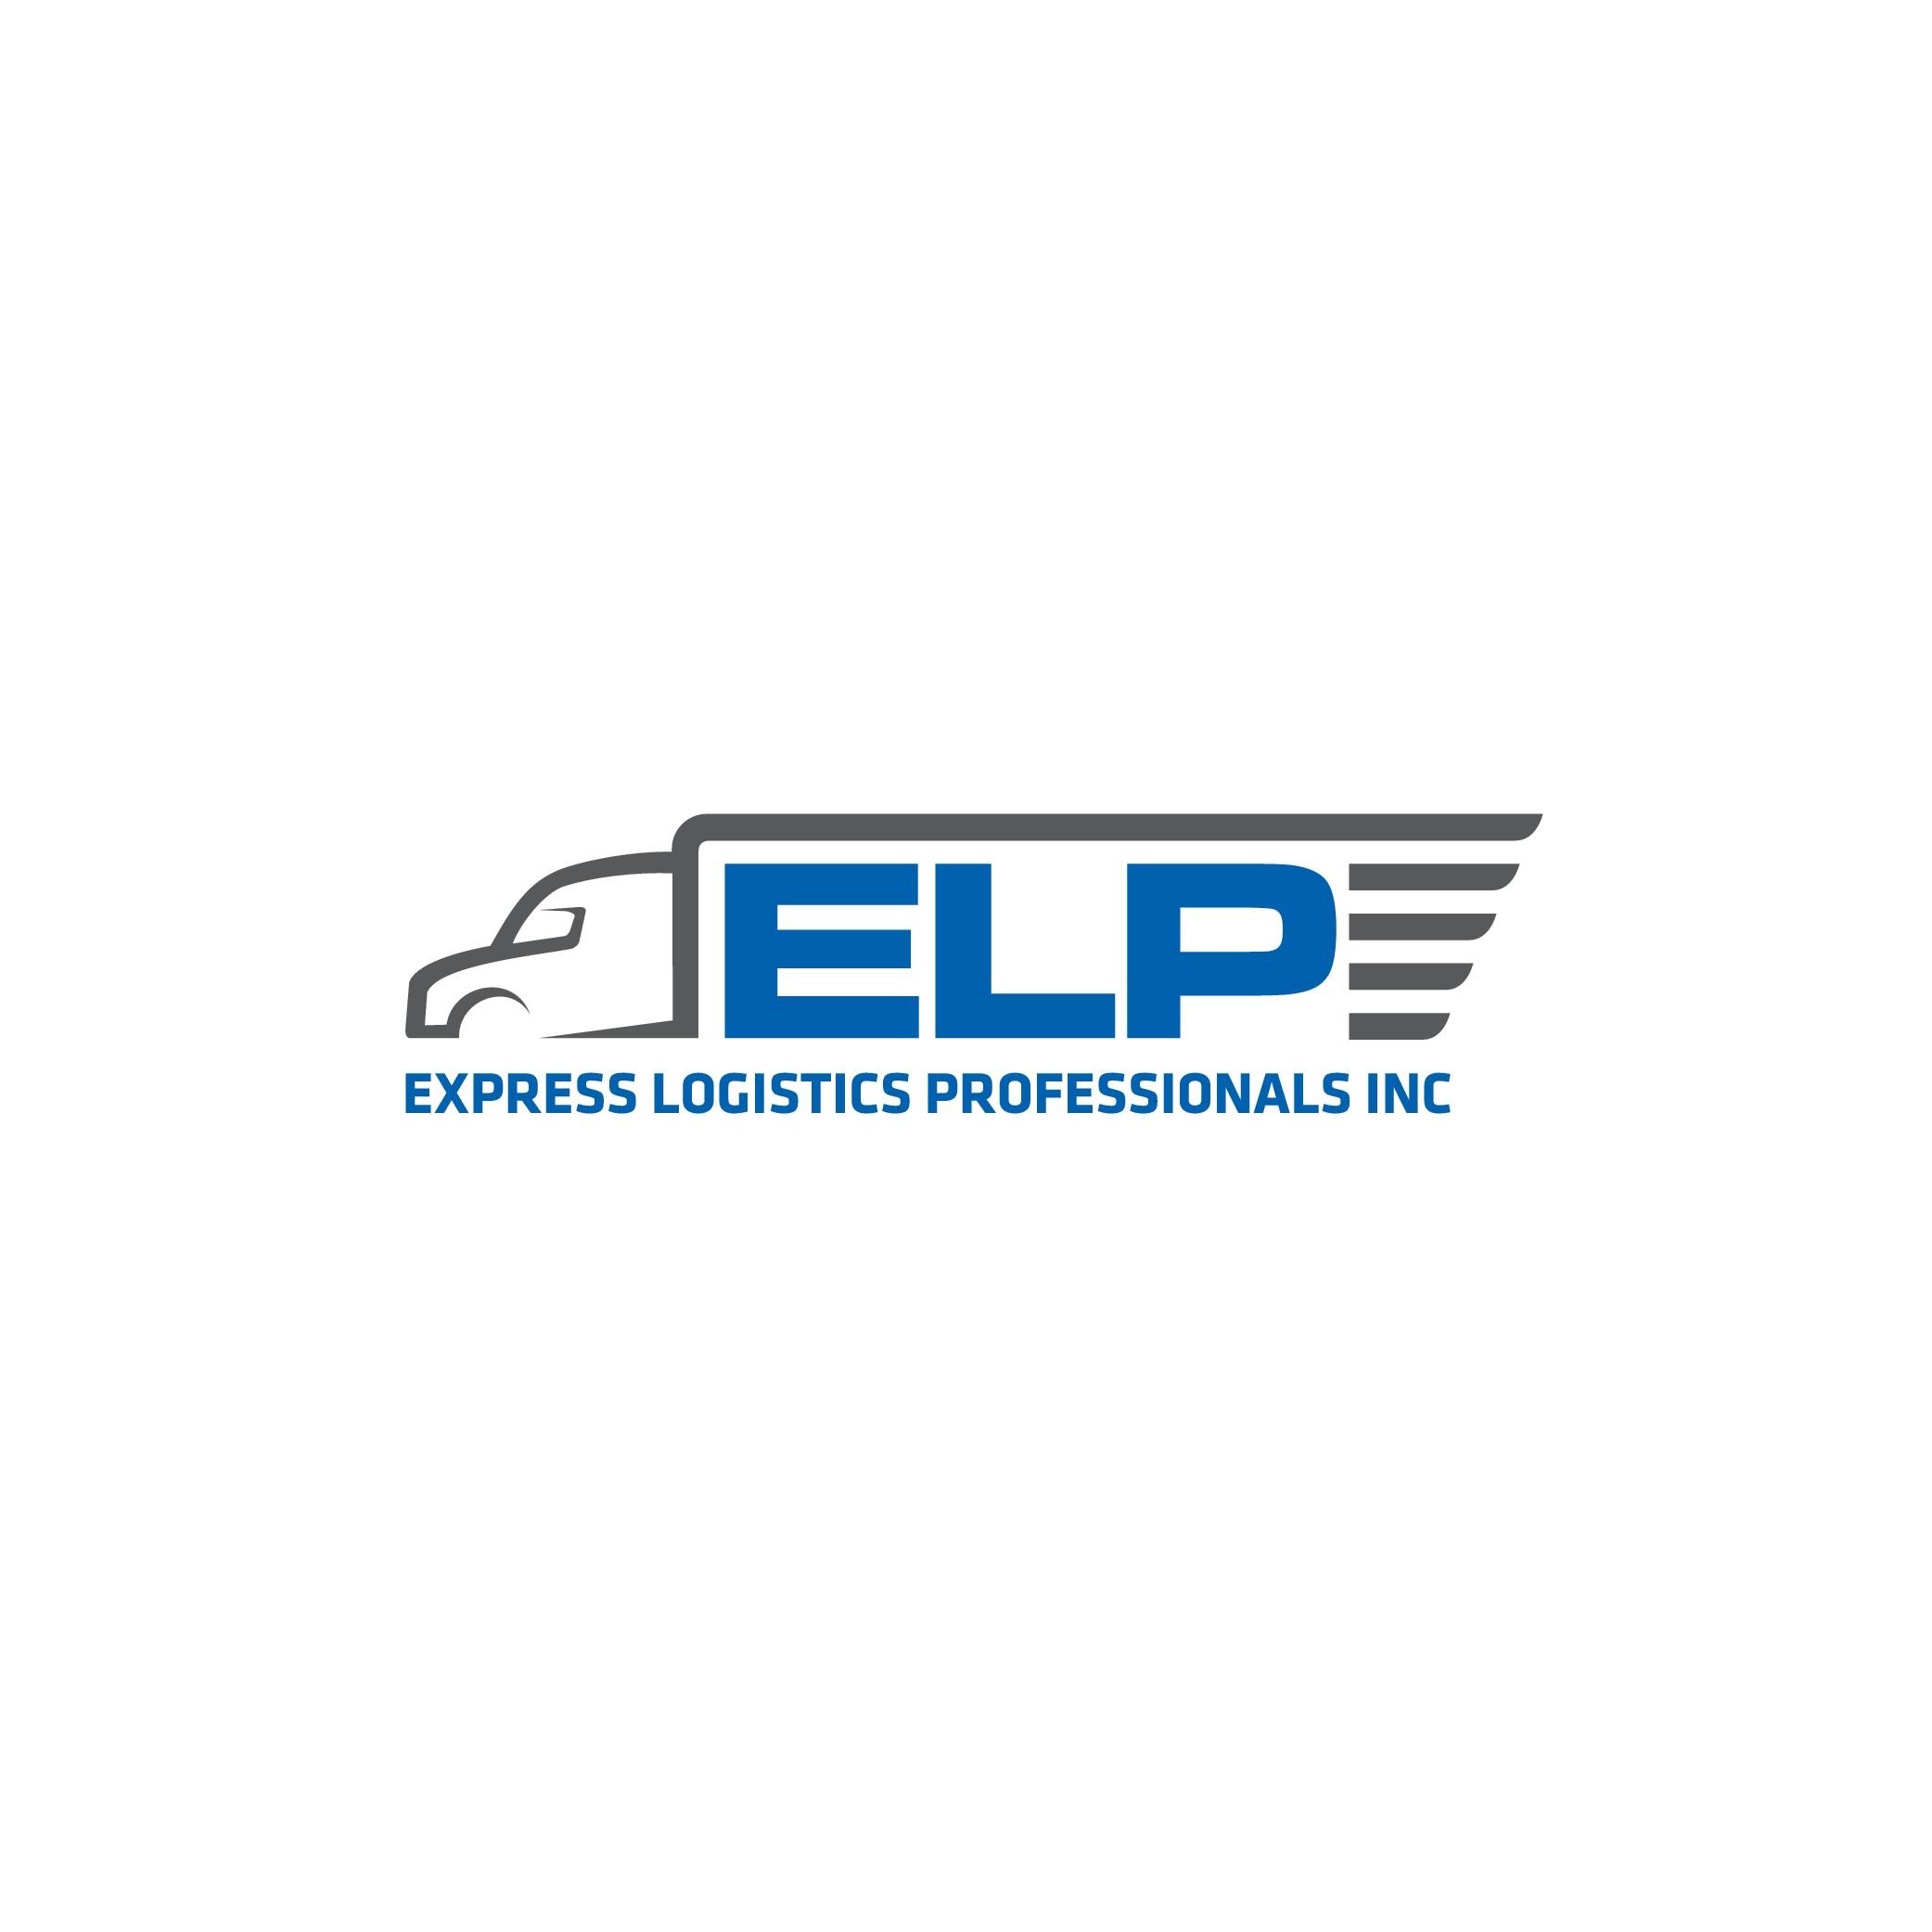 Logistics Company needs a powerful logo